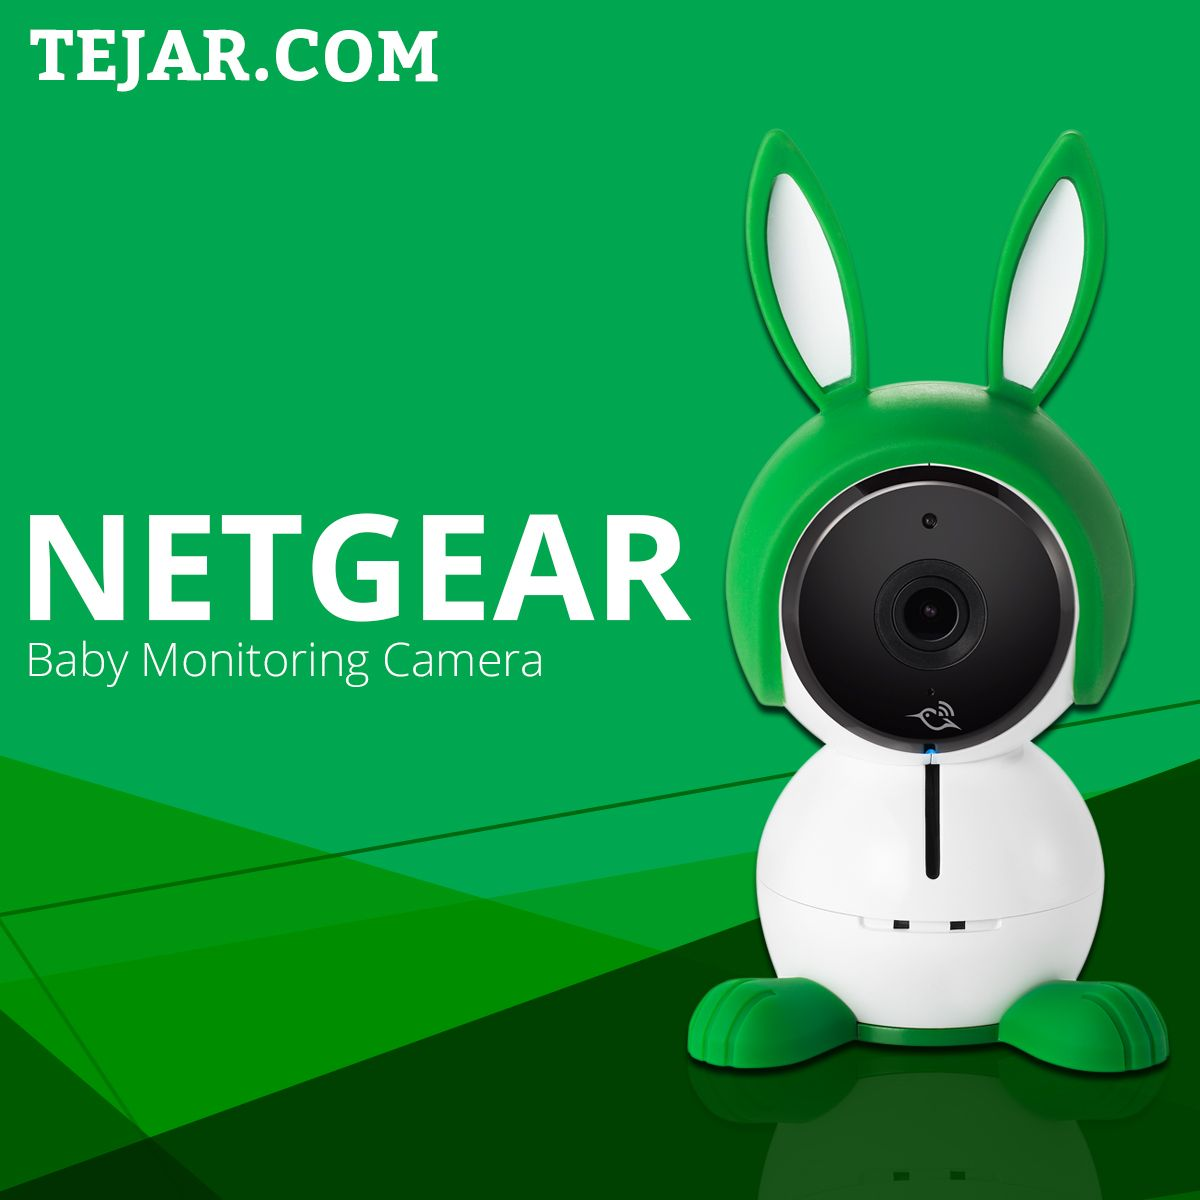 Arlo baby 1080p hd monitoring camera camera netgear